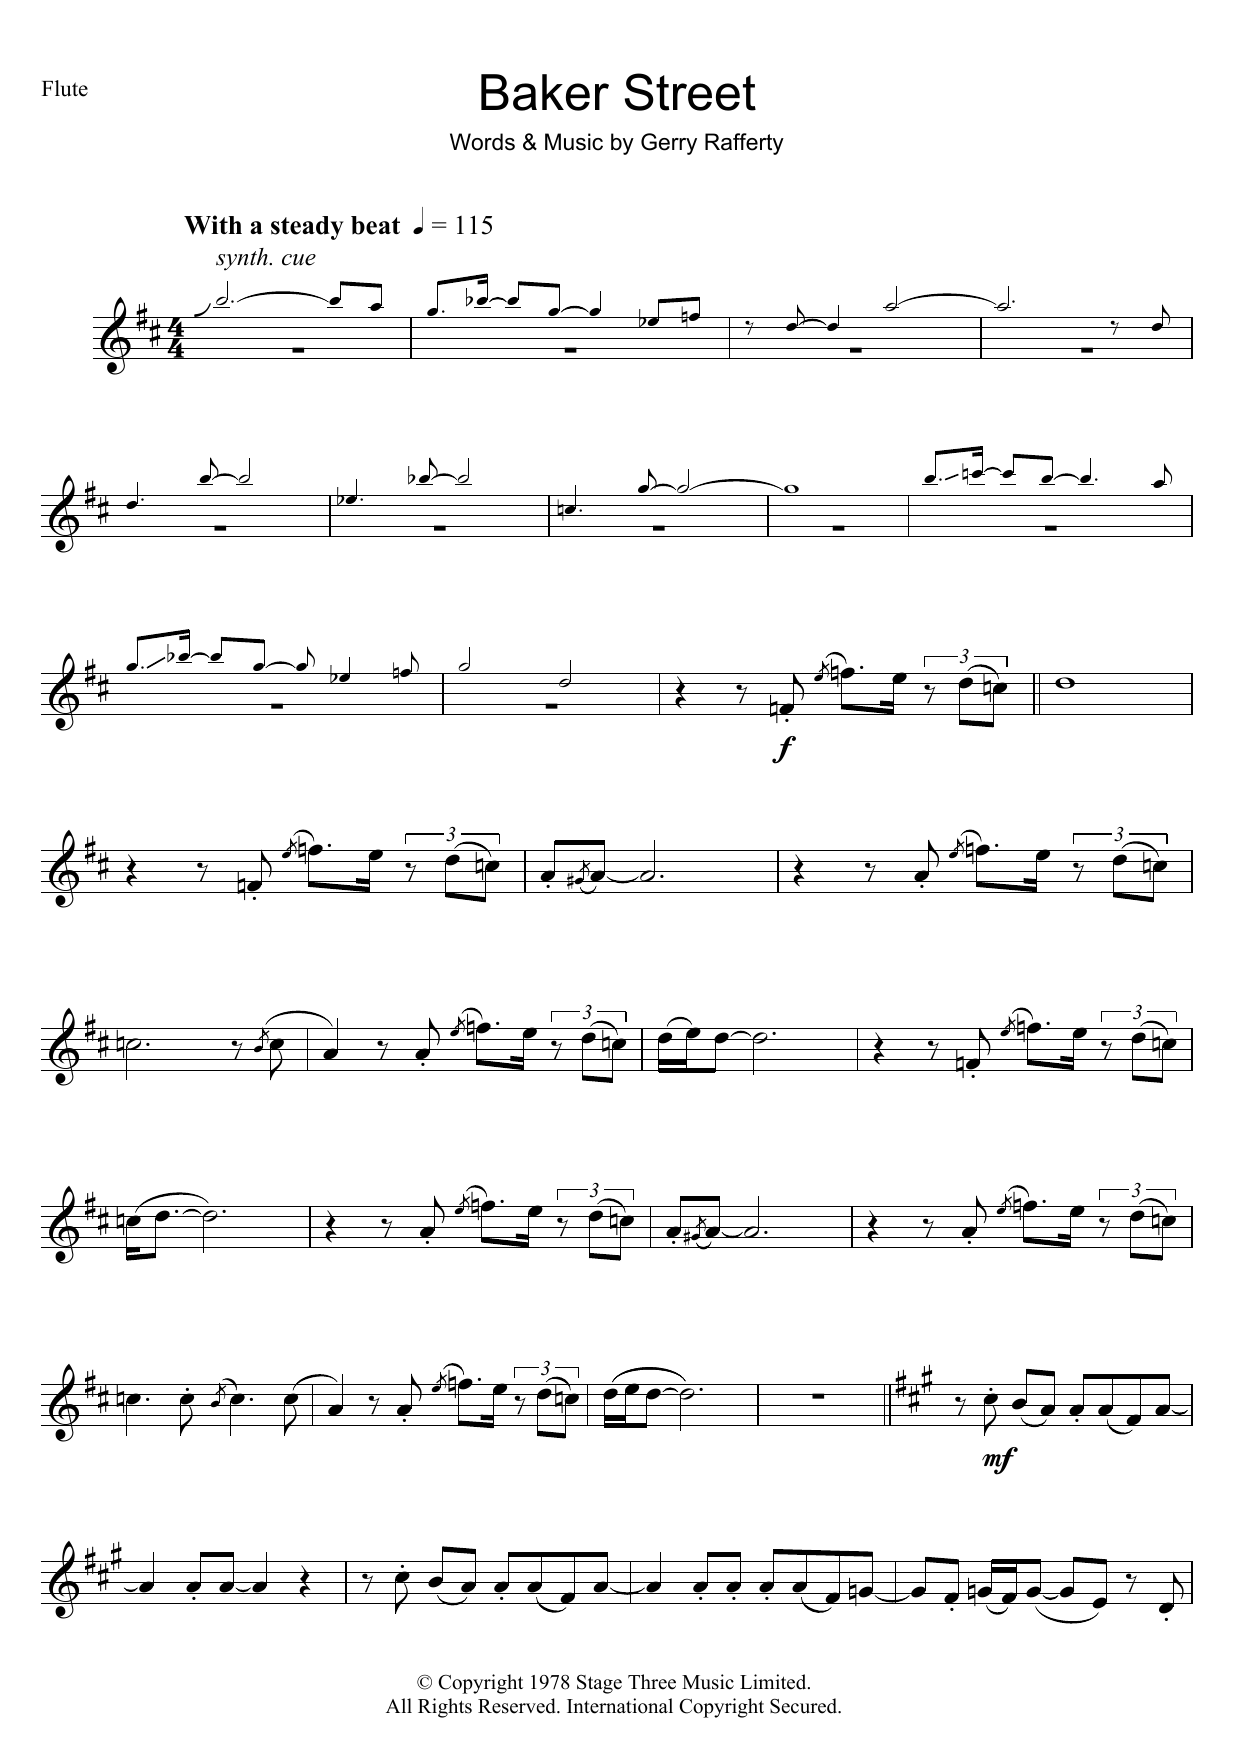 Baker Street (Flute Solo)